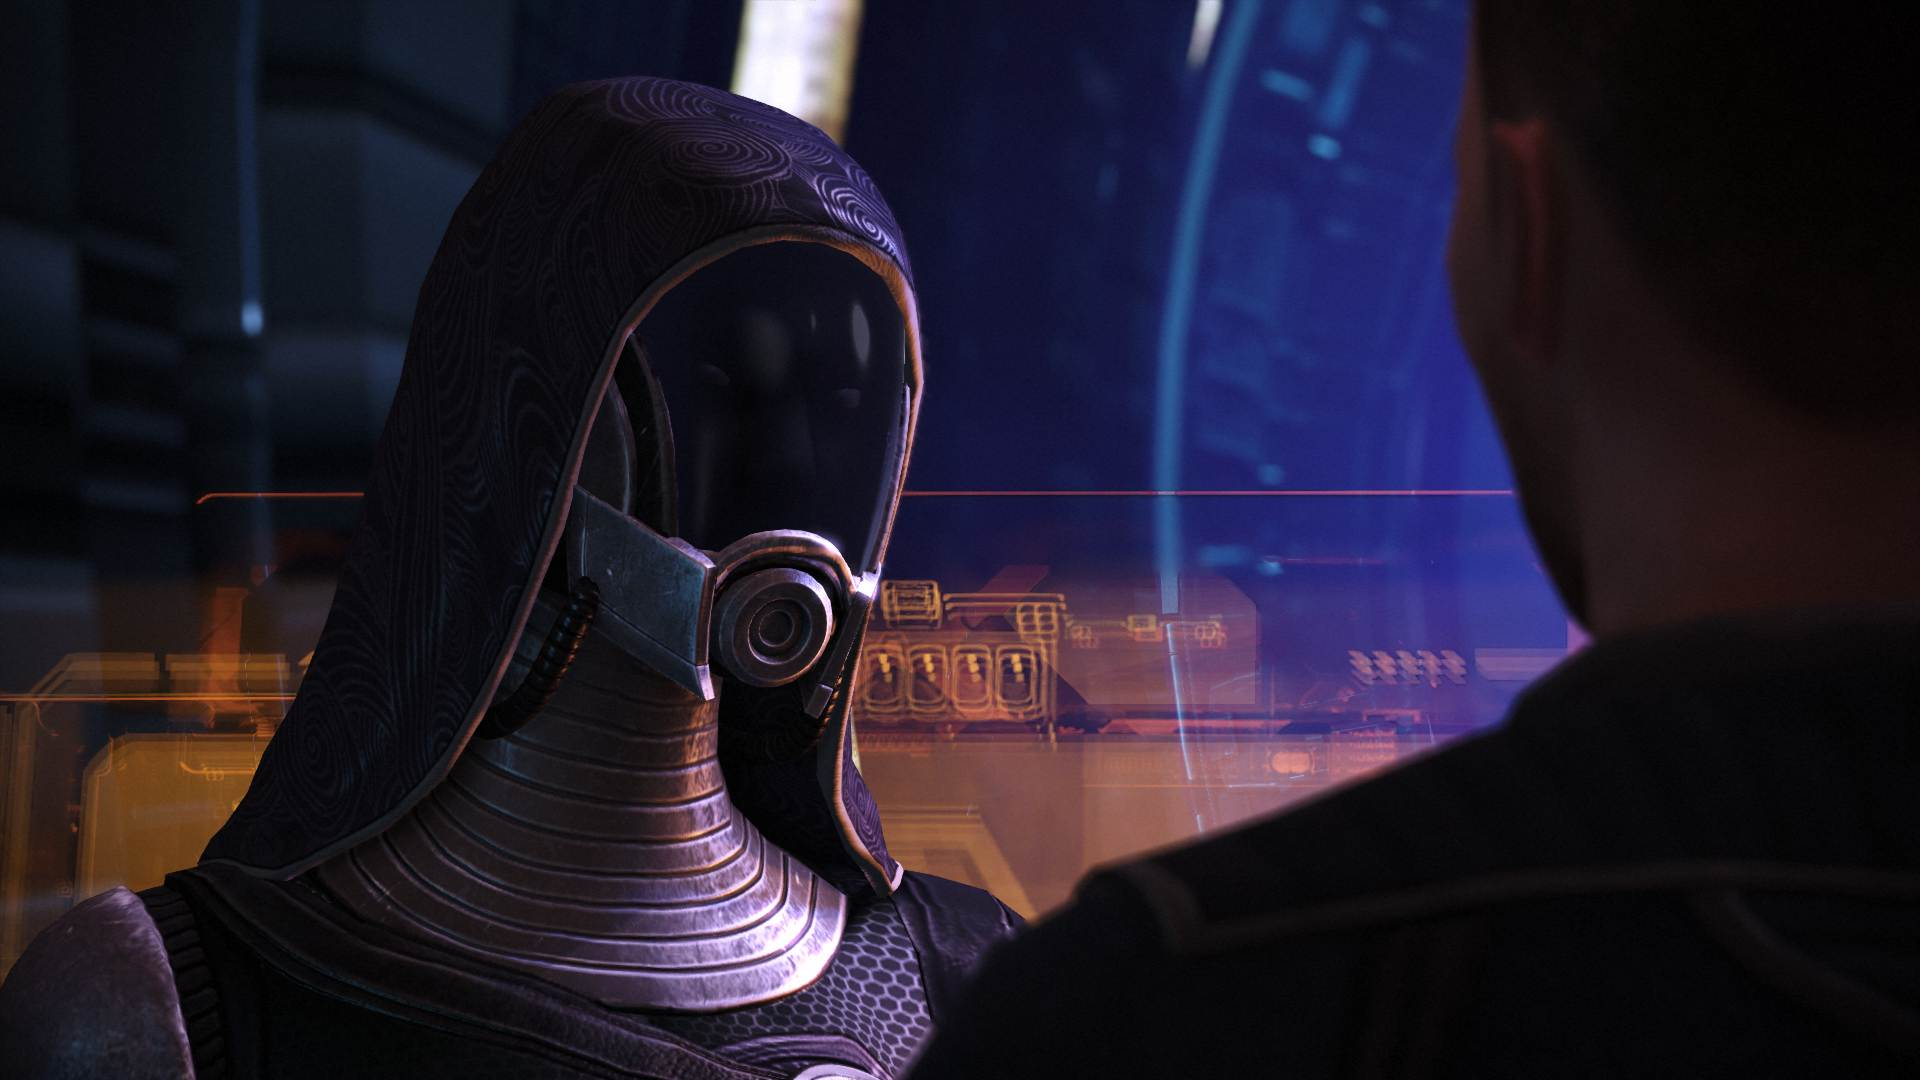 Mass Effect Legendary Edition changes infamous photo of Tali screenshot